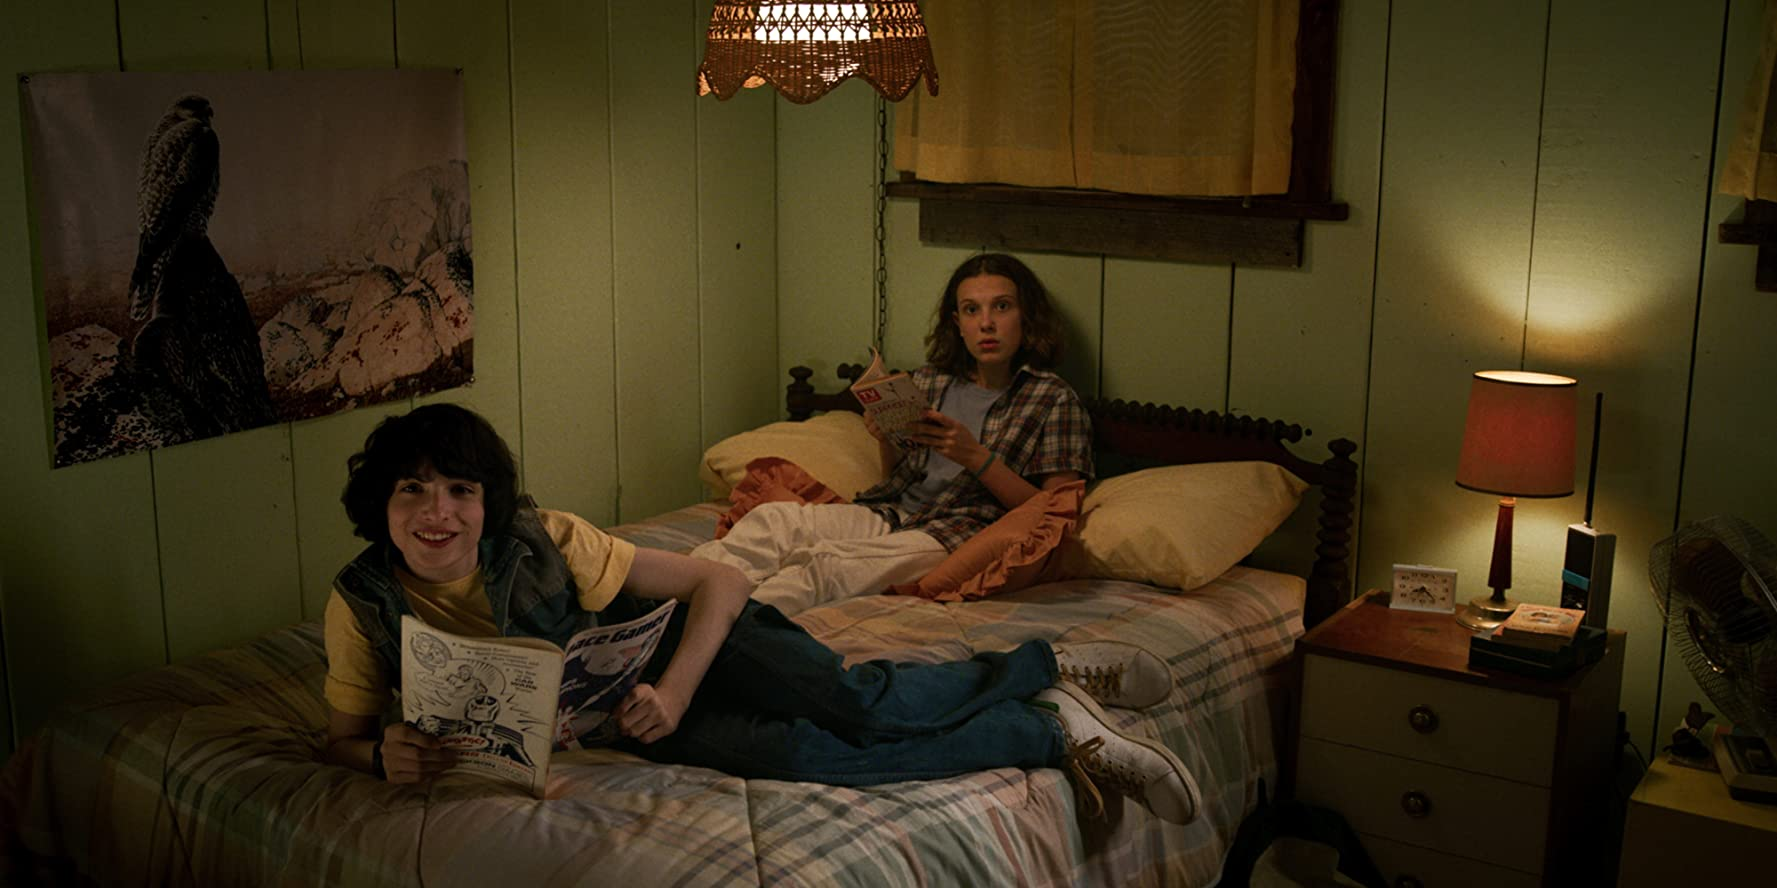 Millie Bobby Brown and Finn Wolfhard in Stranger Things (2016)